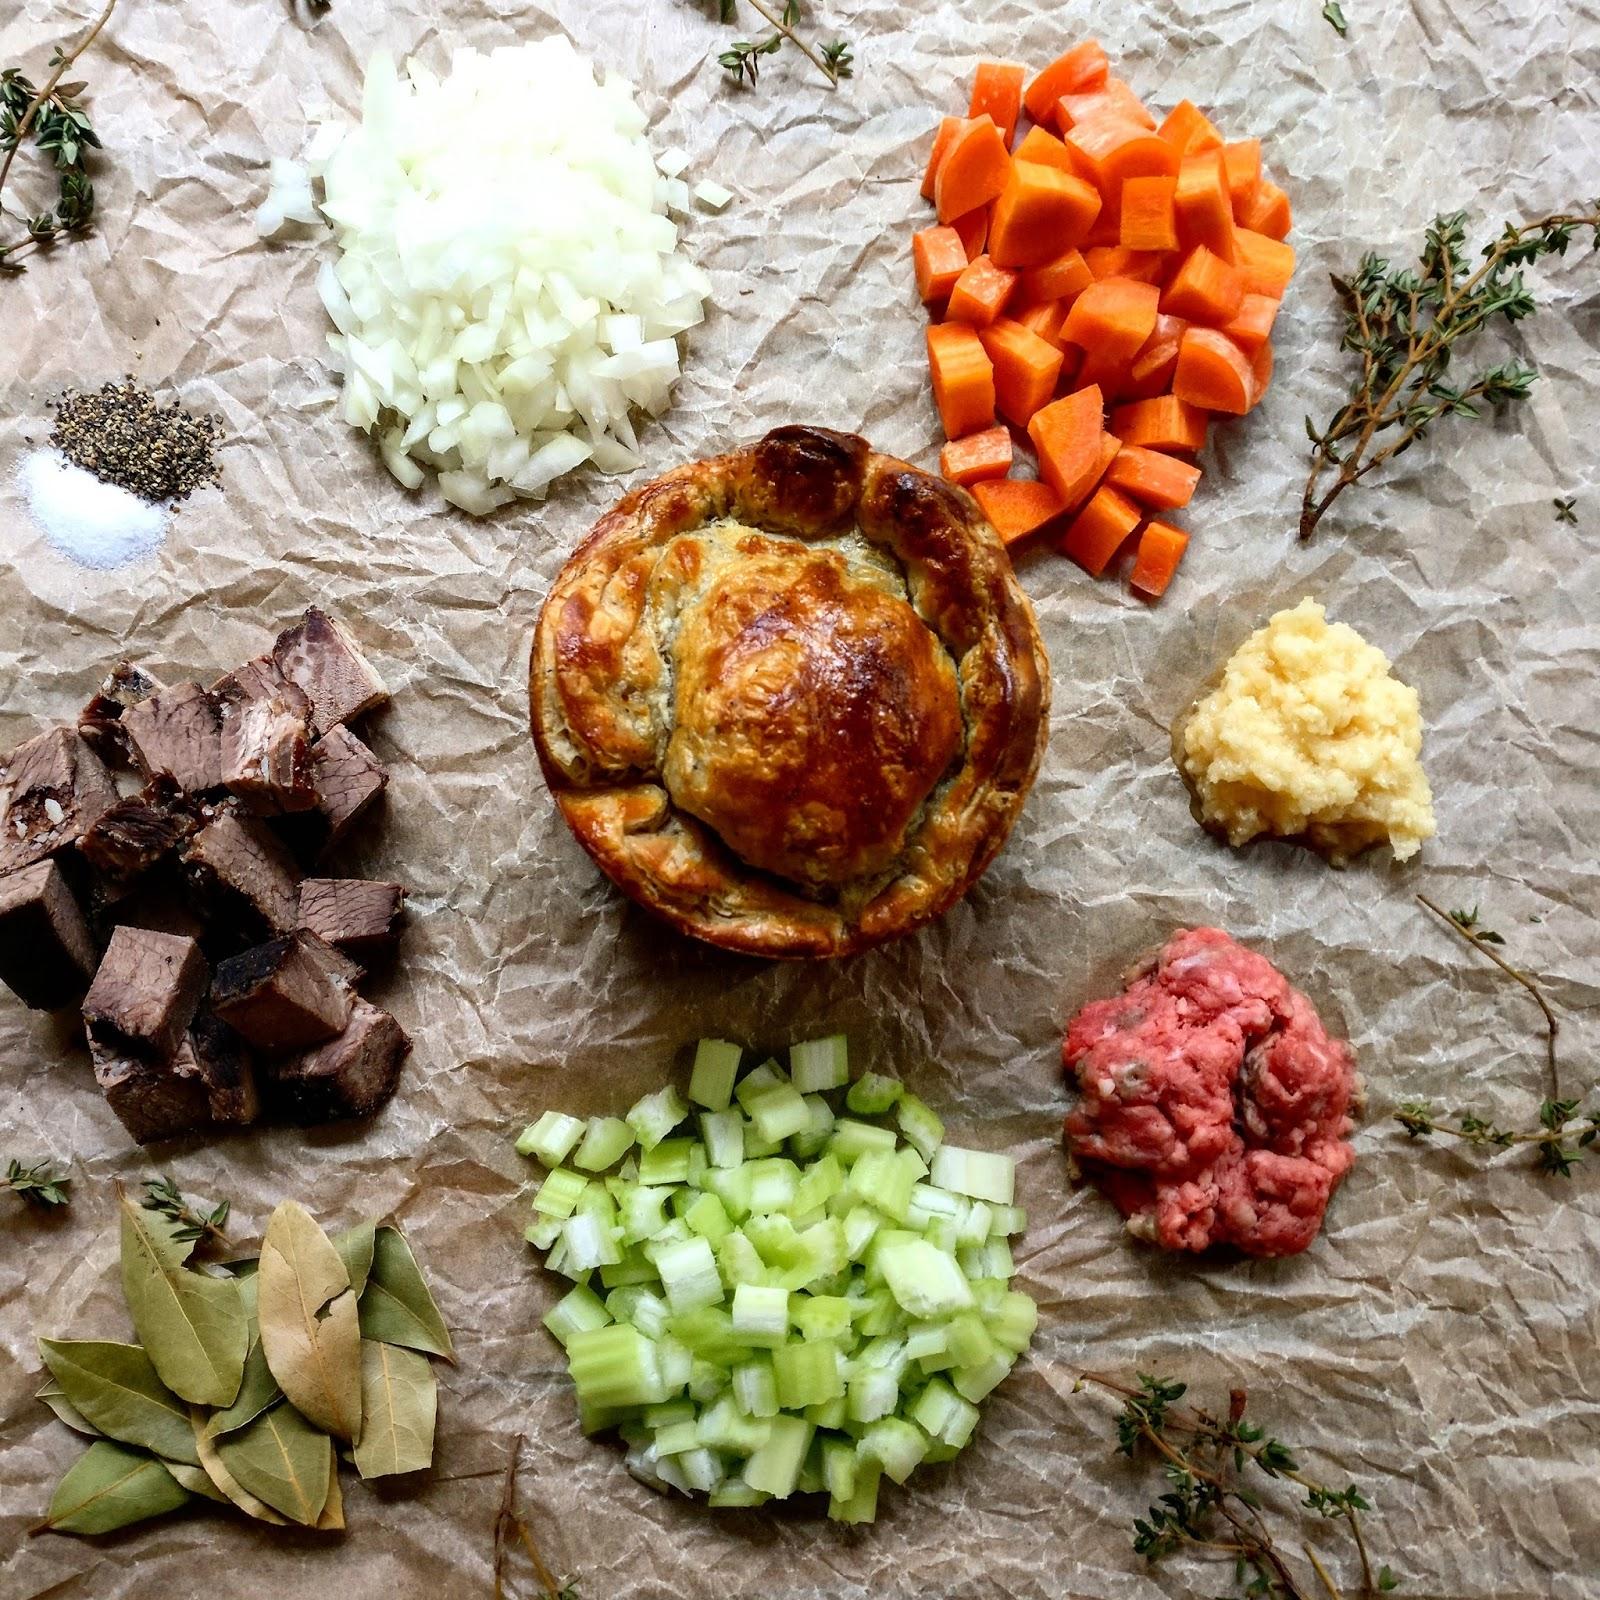 The Windmill Mayfair's Award-Winning Steak And Kidney Pie Recipe